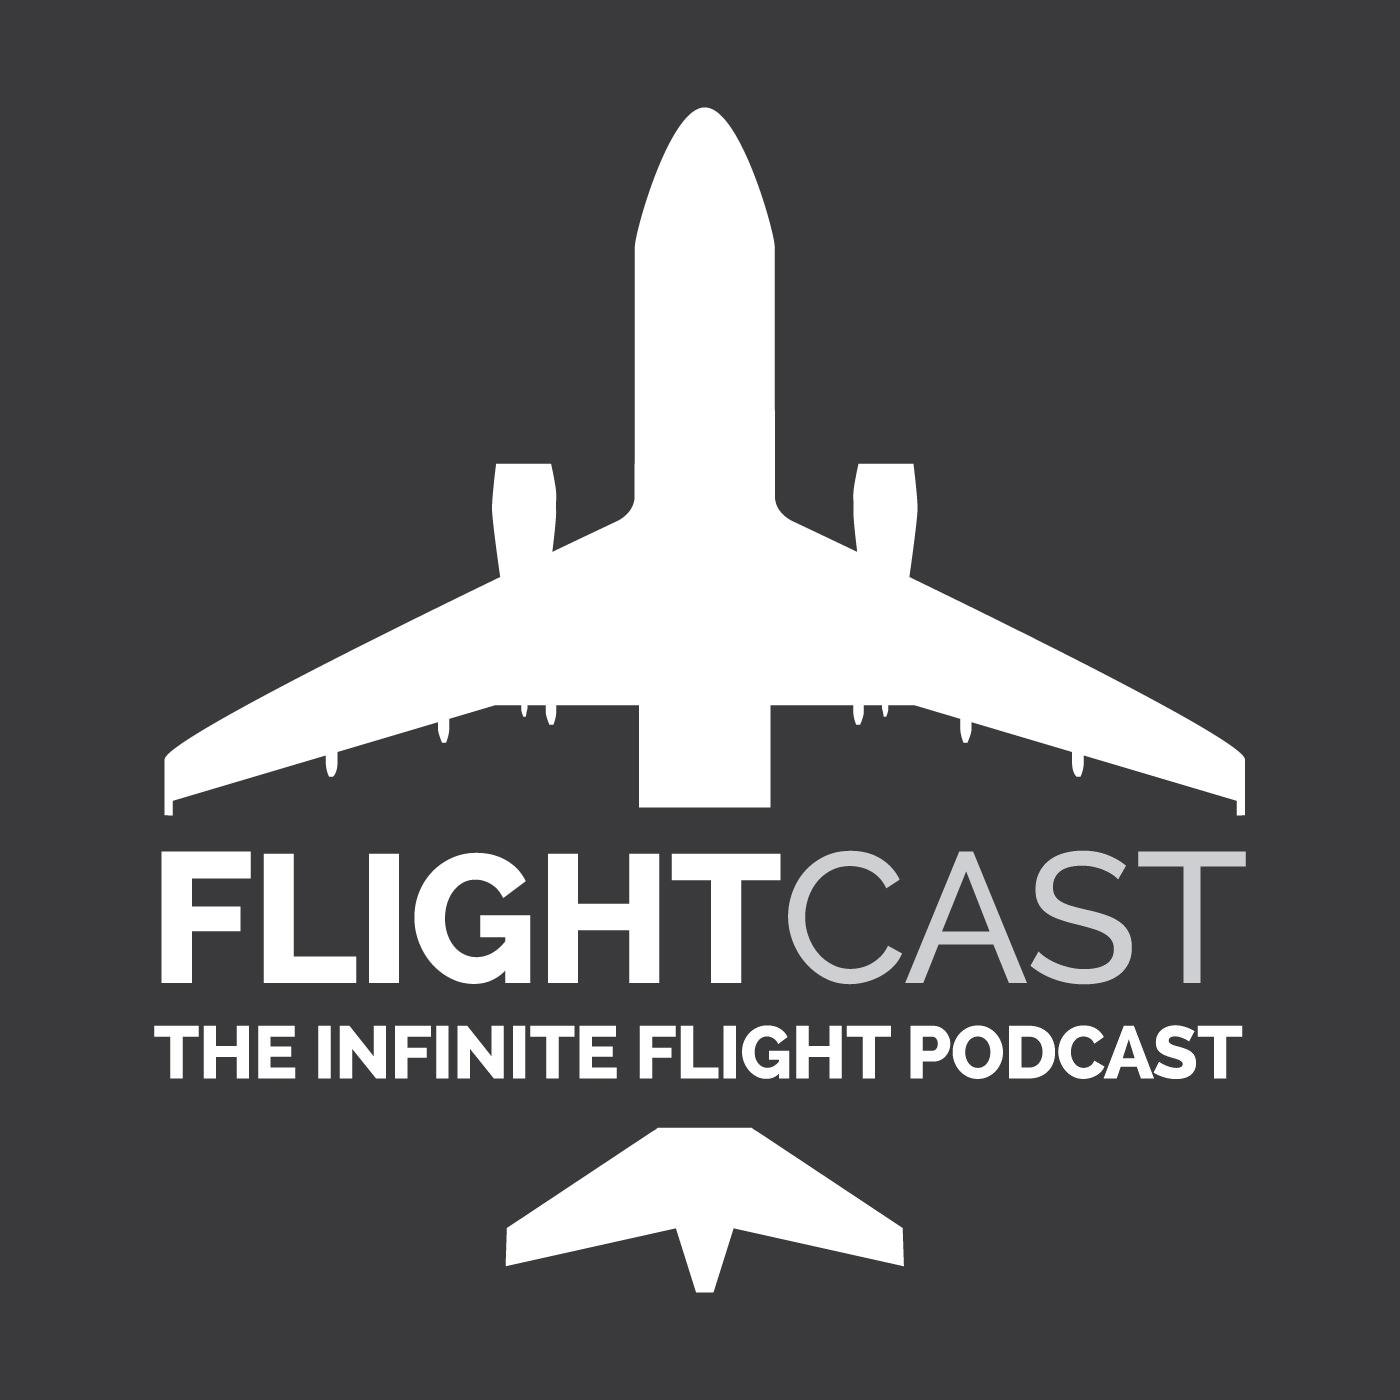 FlightCast